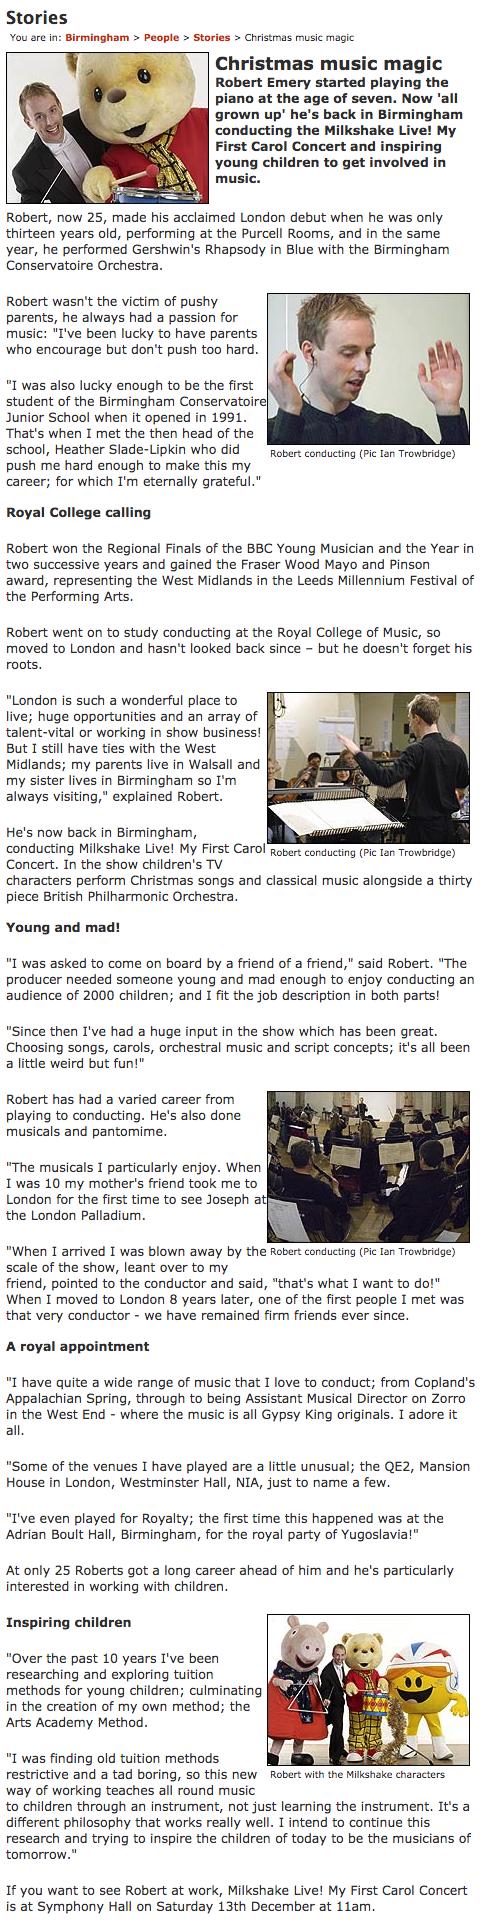 Robert Emery My First Carol Concert